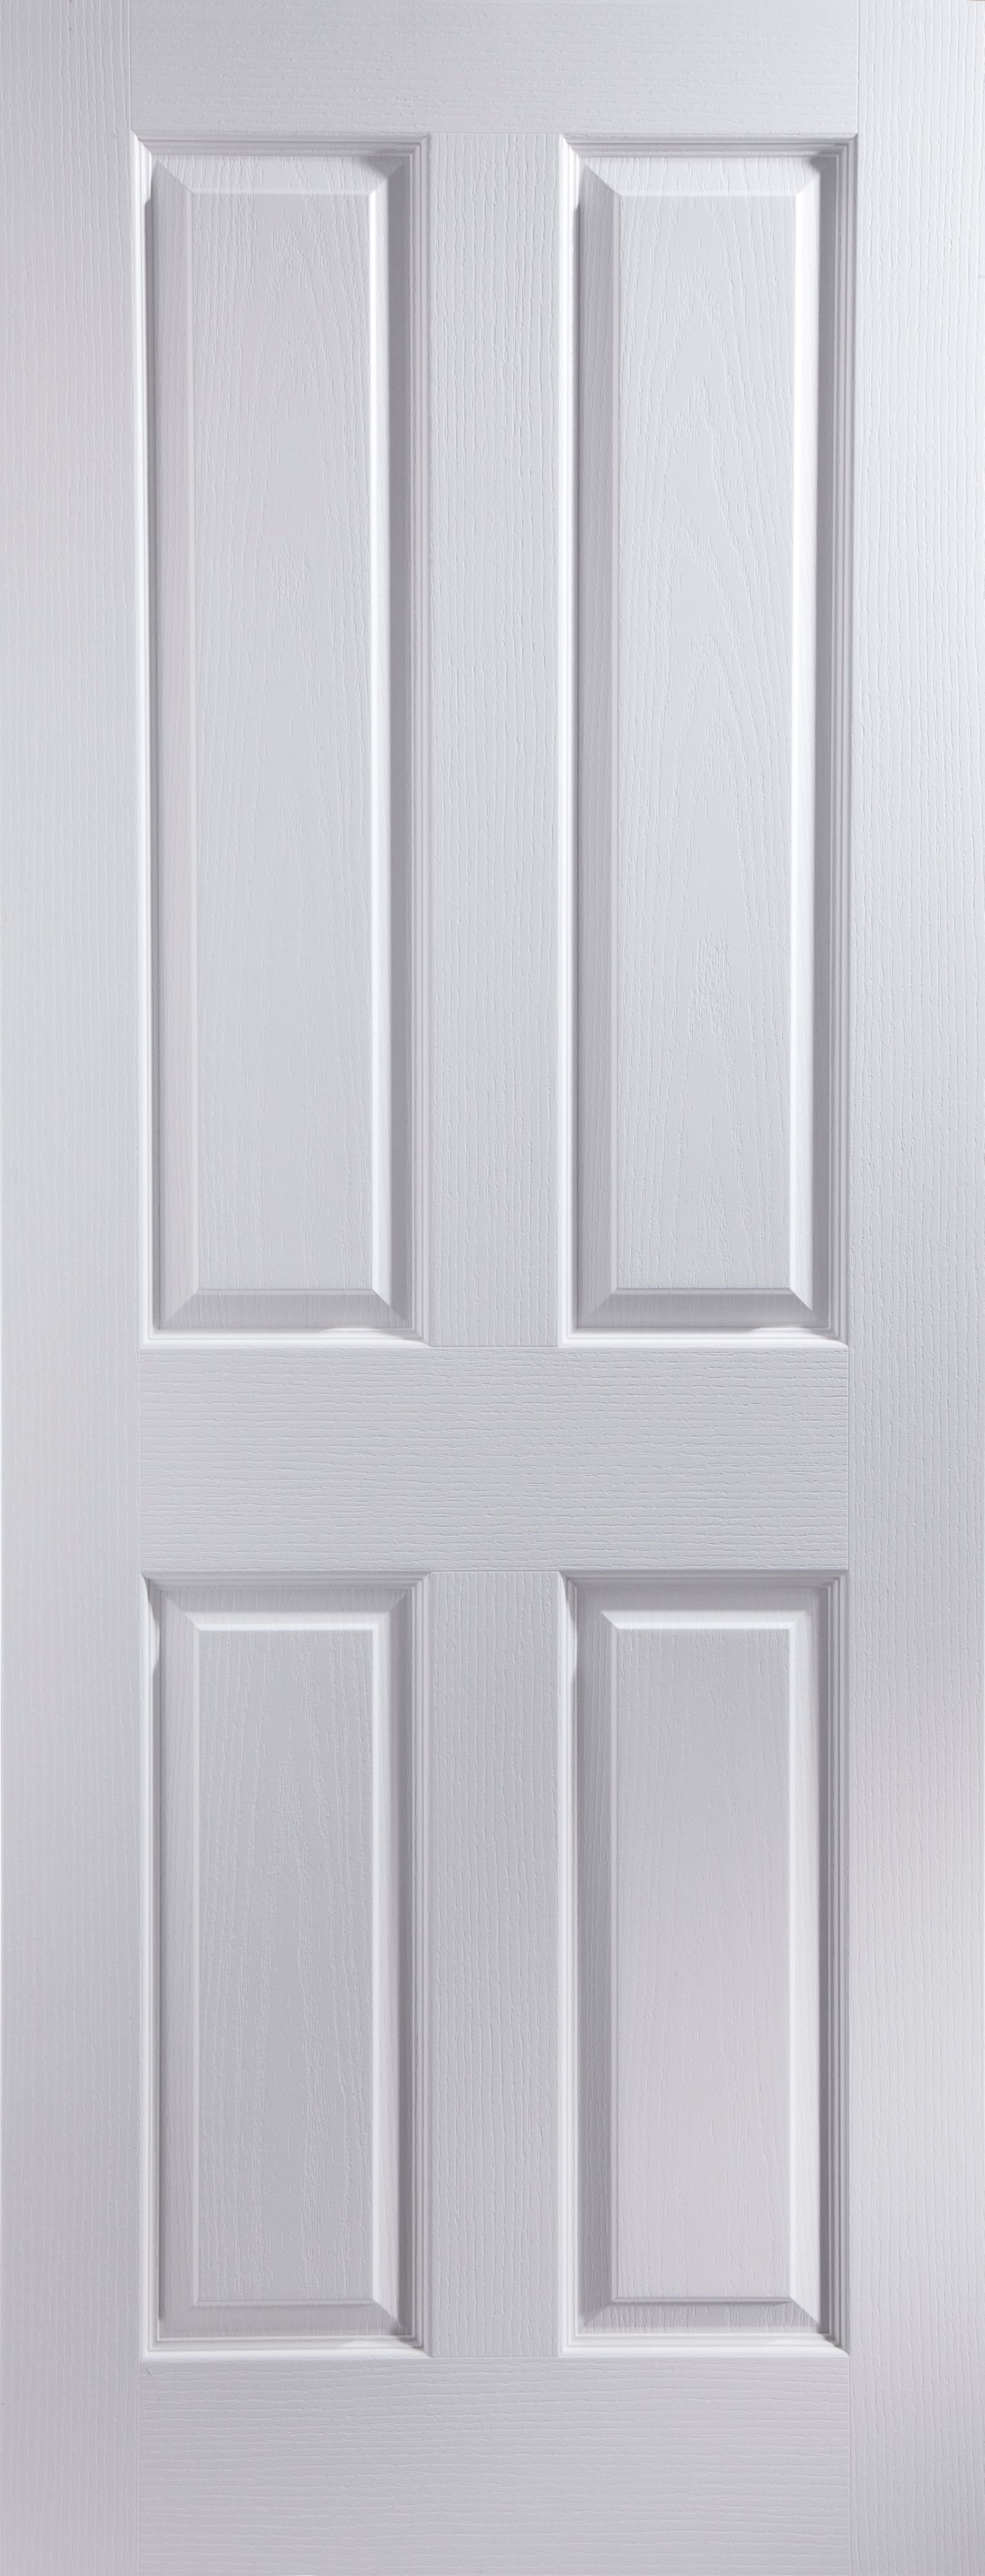 4 Panel Pre Painted White Woodgrain Unglazed Internal Standard Door